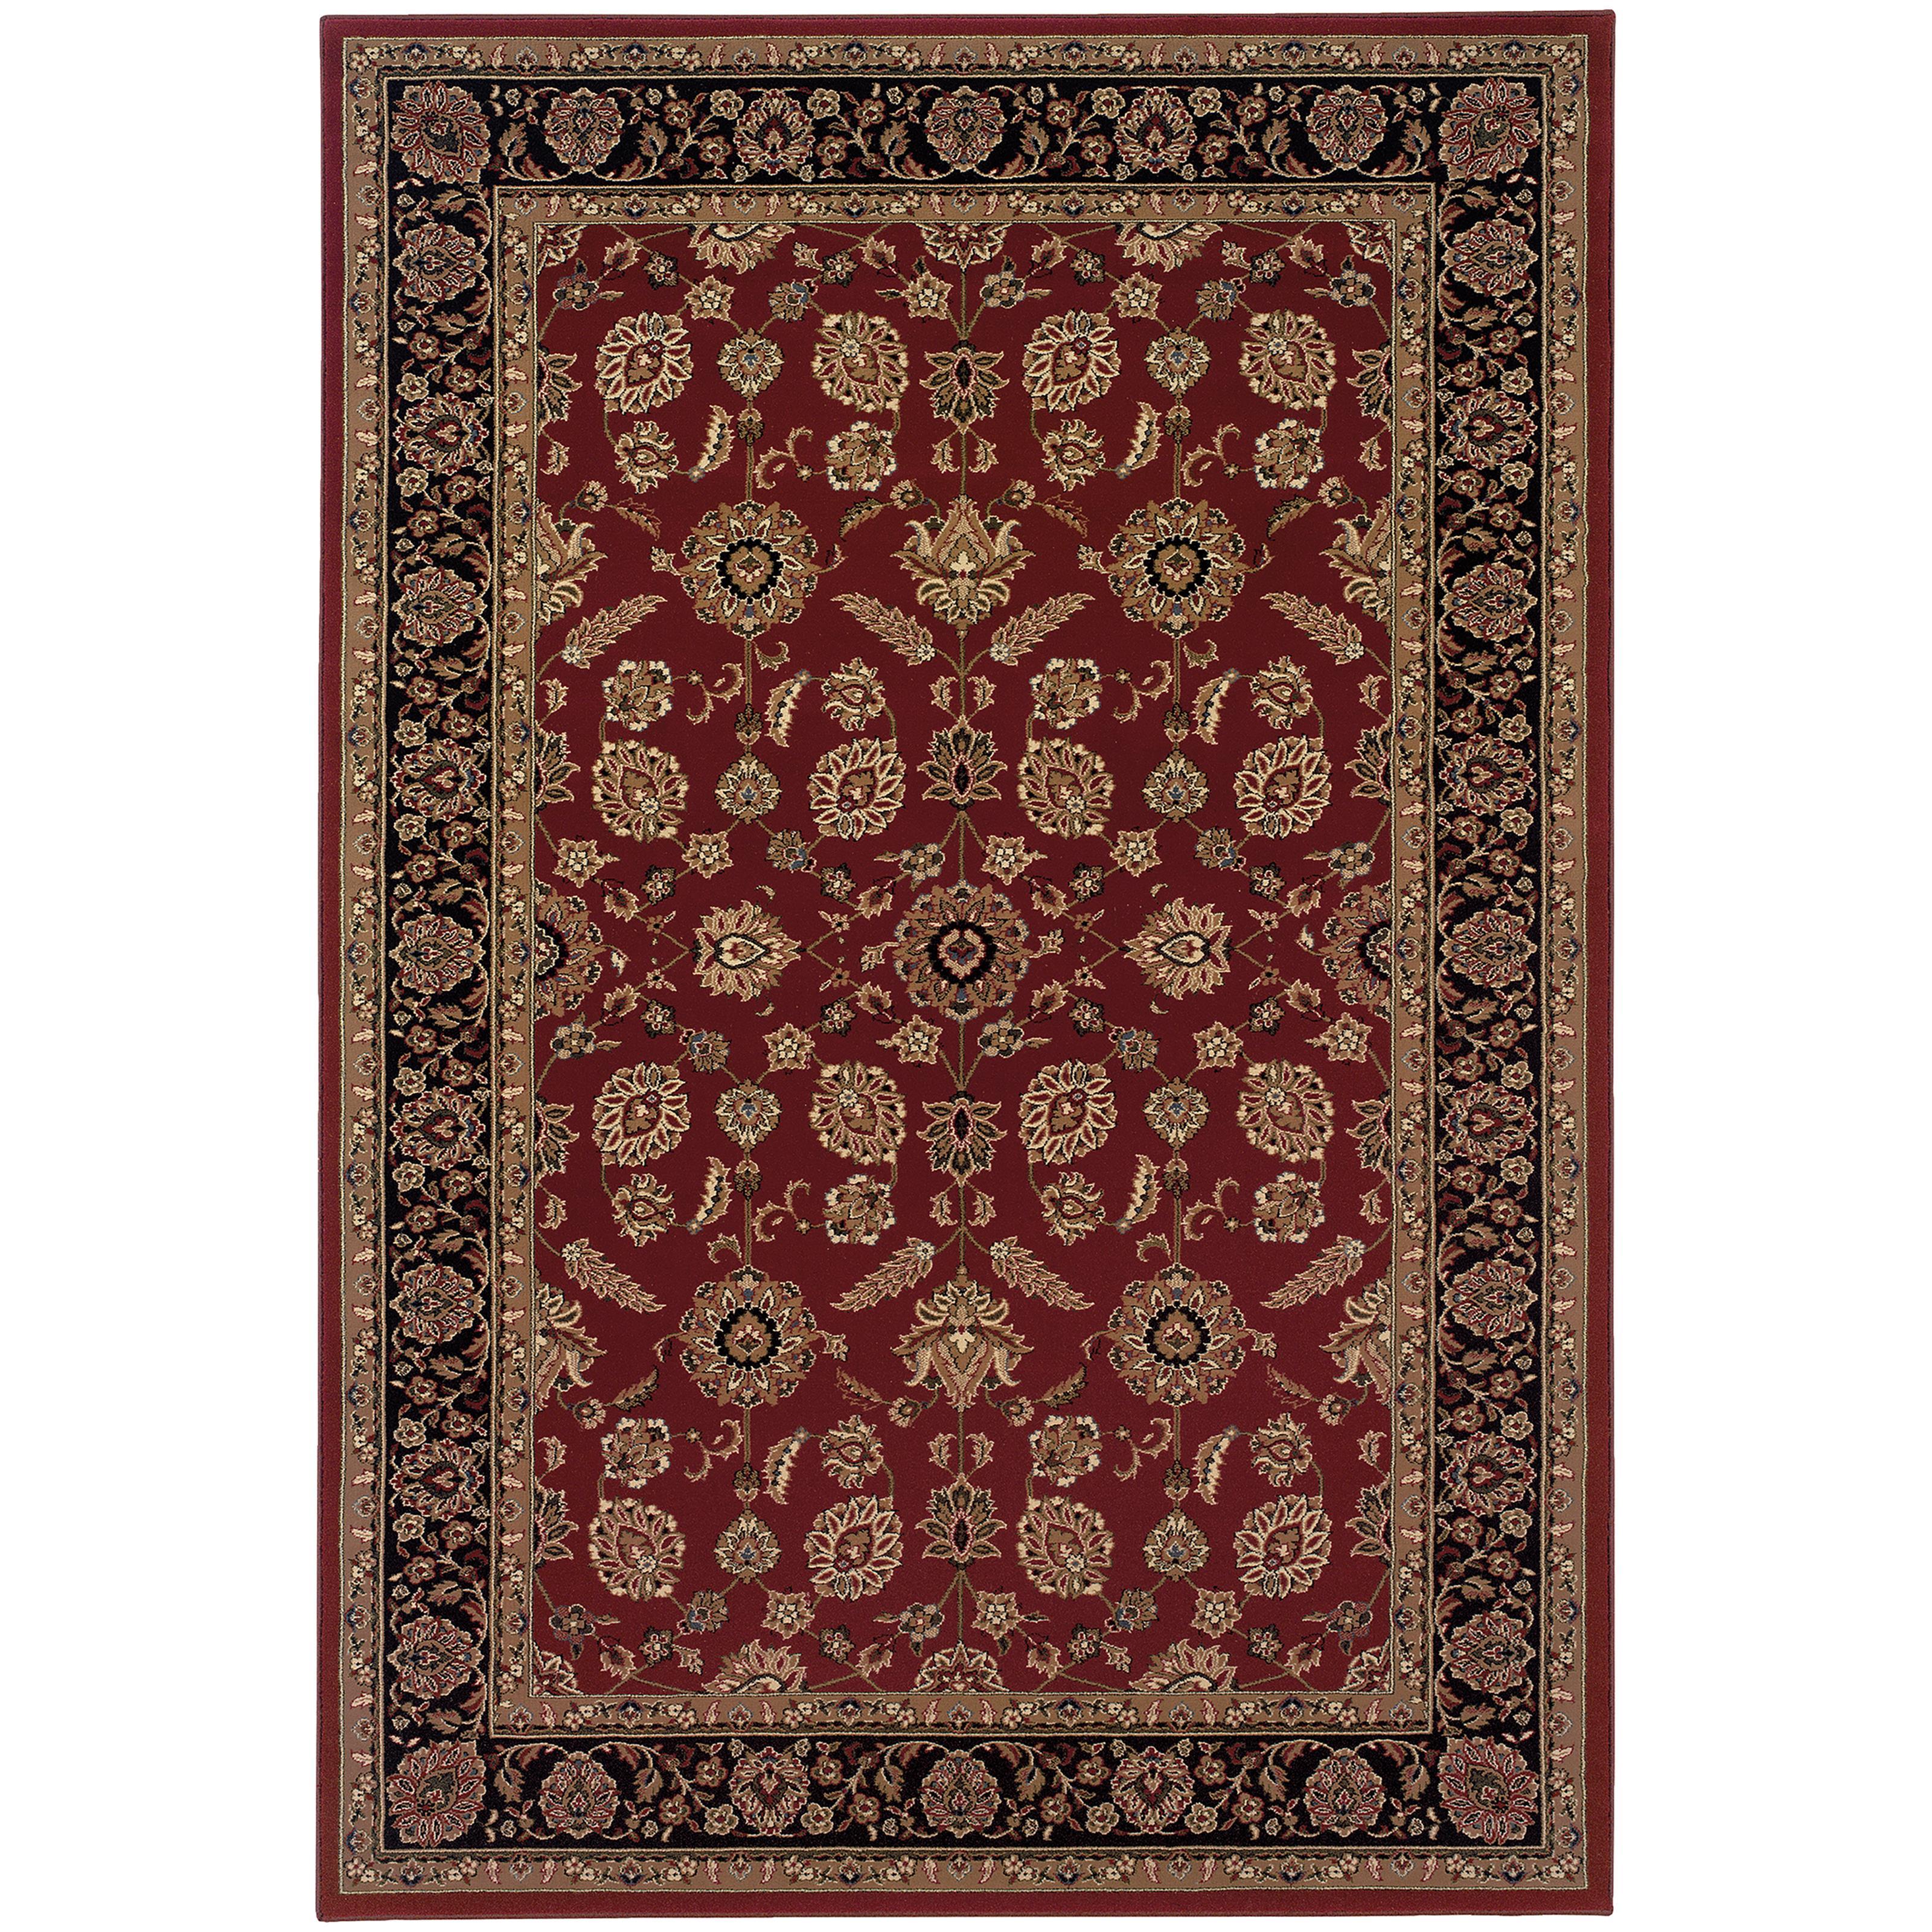 "Oriental Weavers Ariana 7'10"" X 11' Rug - Item Number: A271C3240330ST"